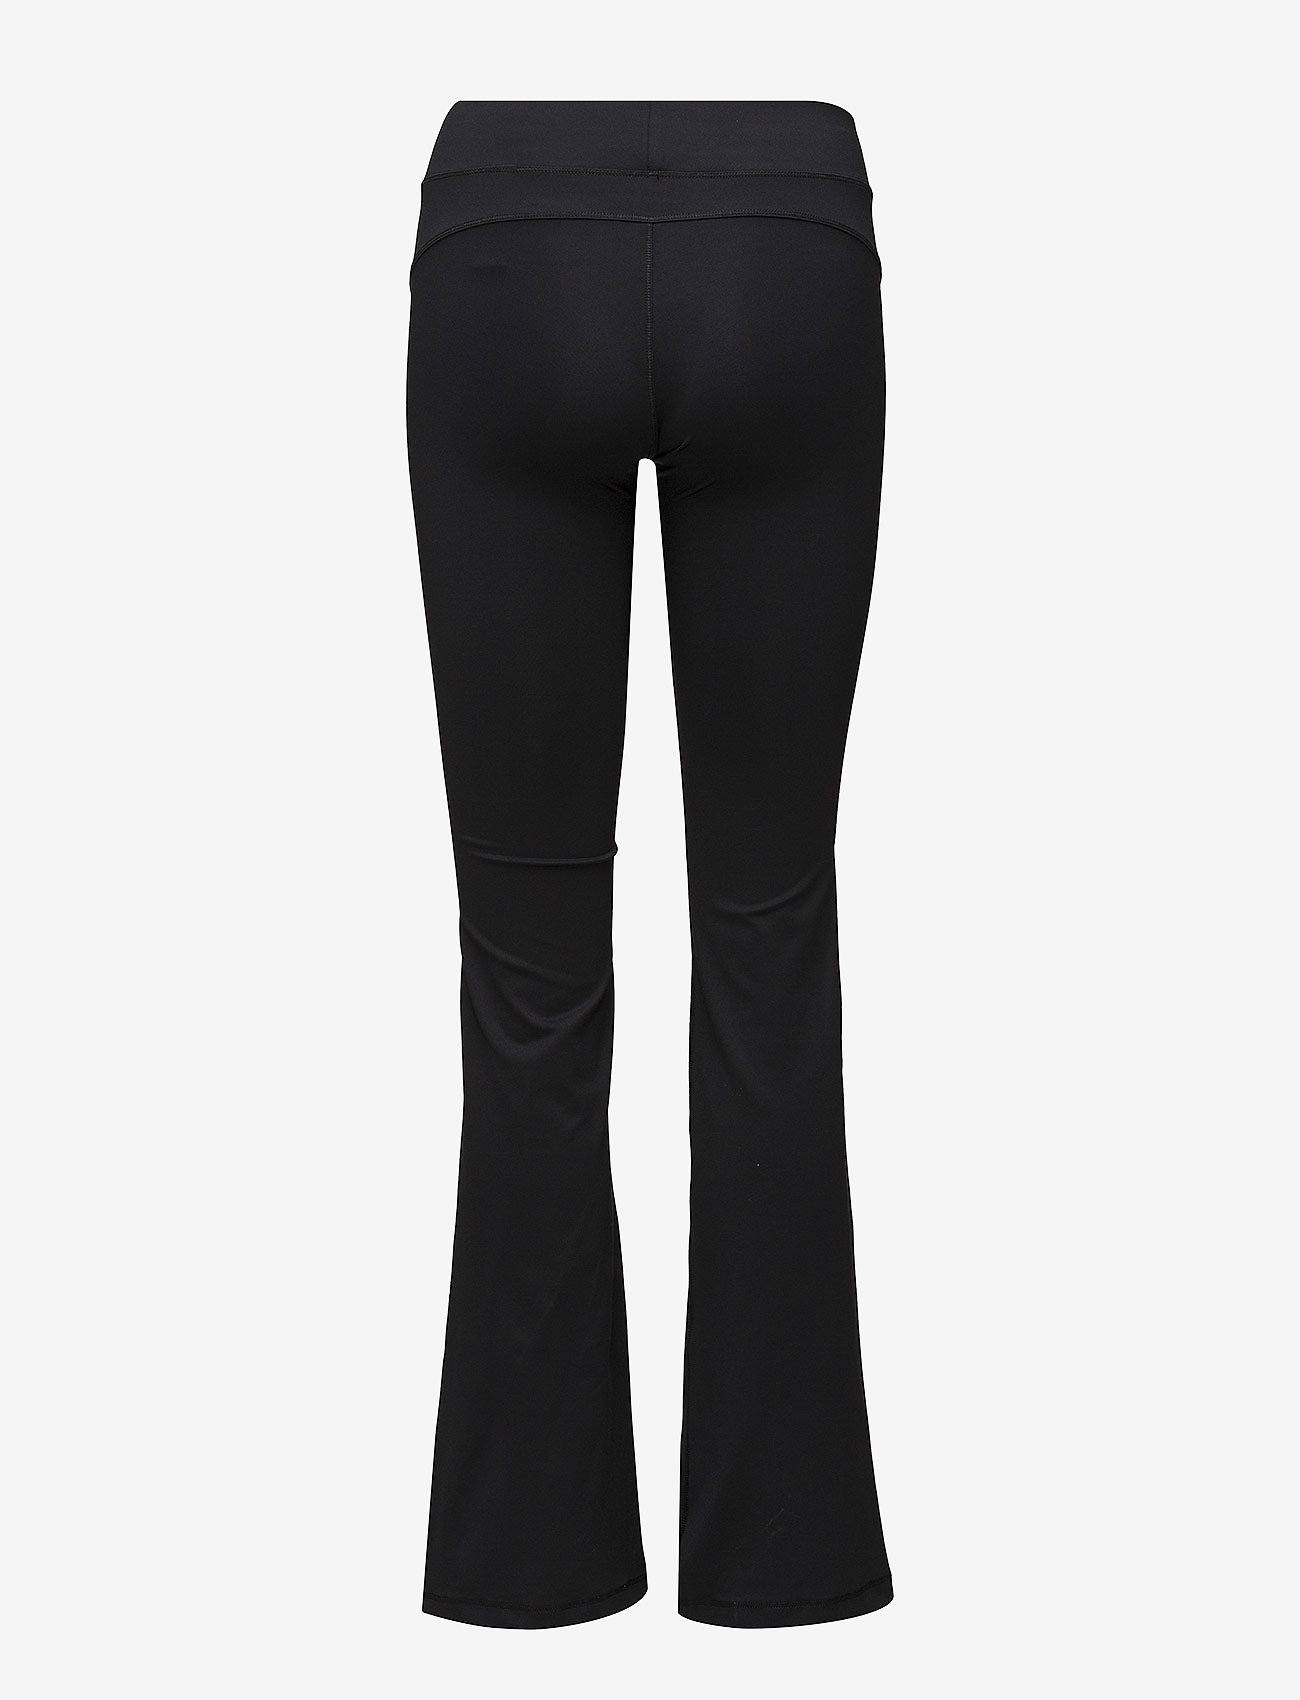 Jazzpants (Black) - Casall PBCjgS